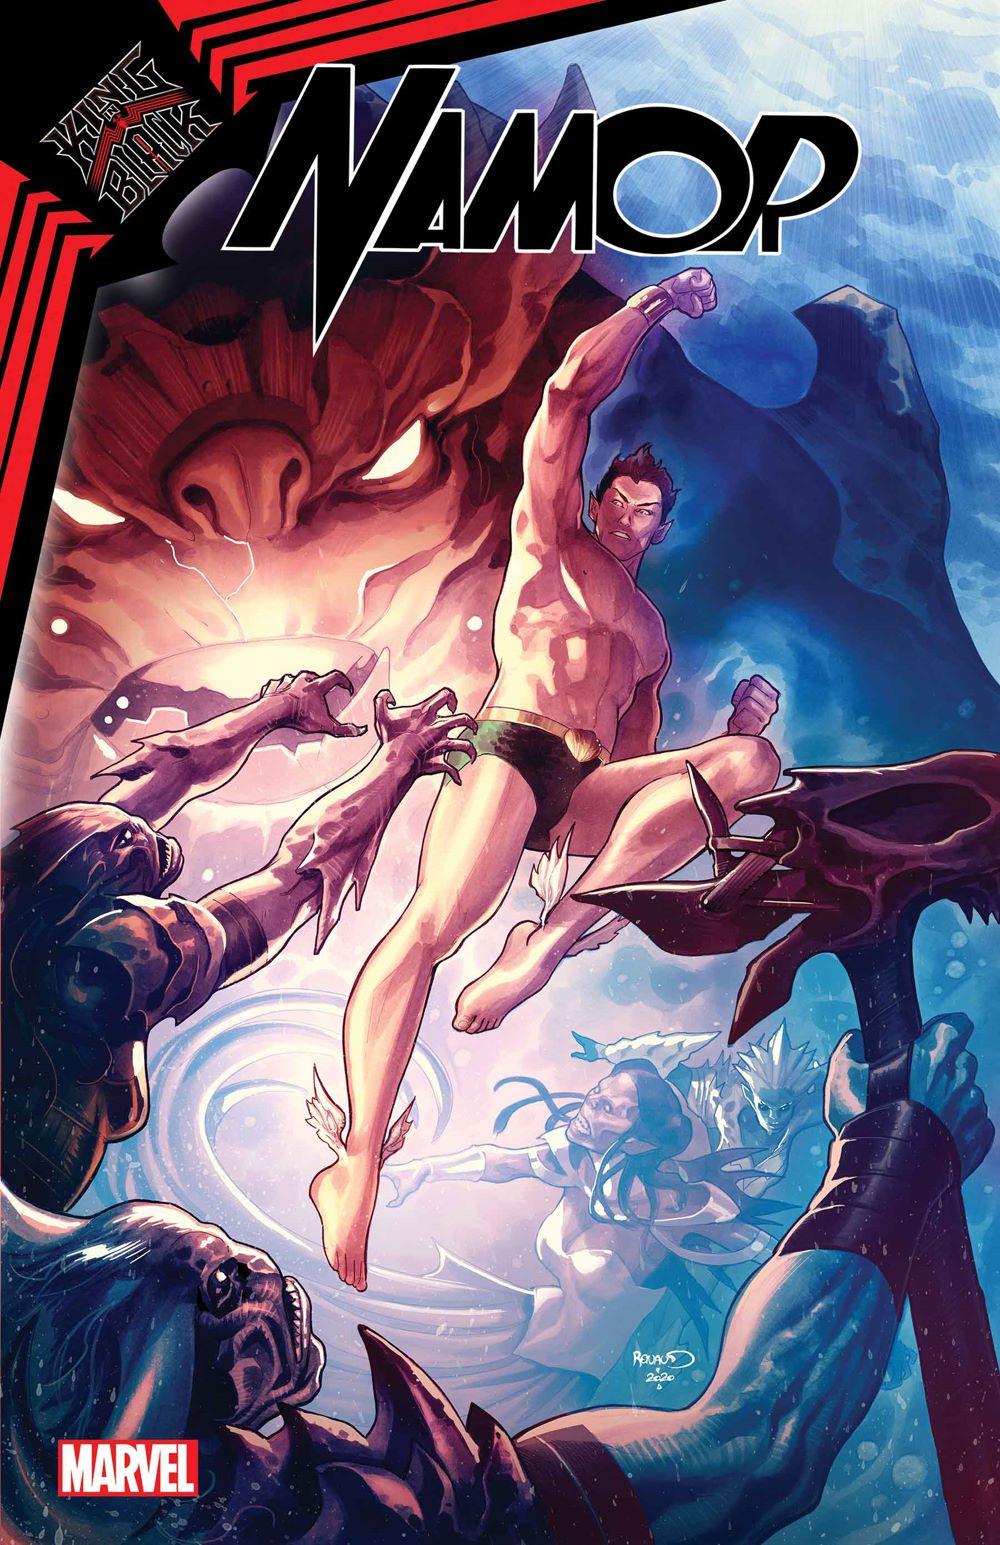 NAMORKIB2020003_Renaud_Var Marvel Comics Extended Forecast for 10/28/2020